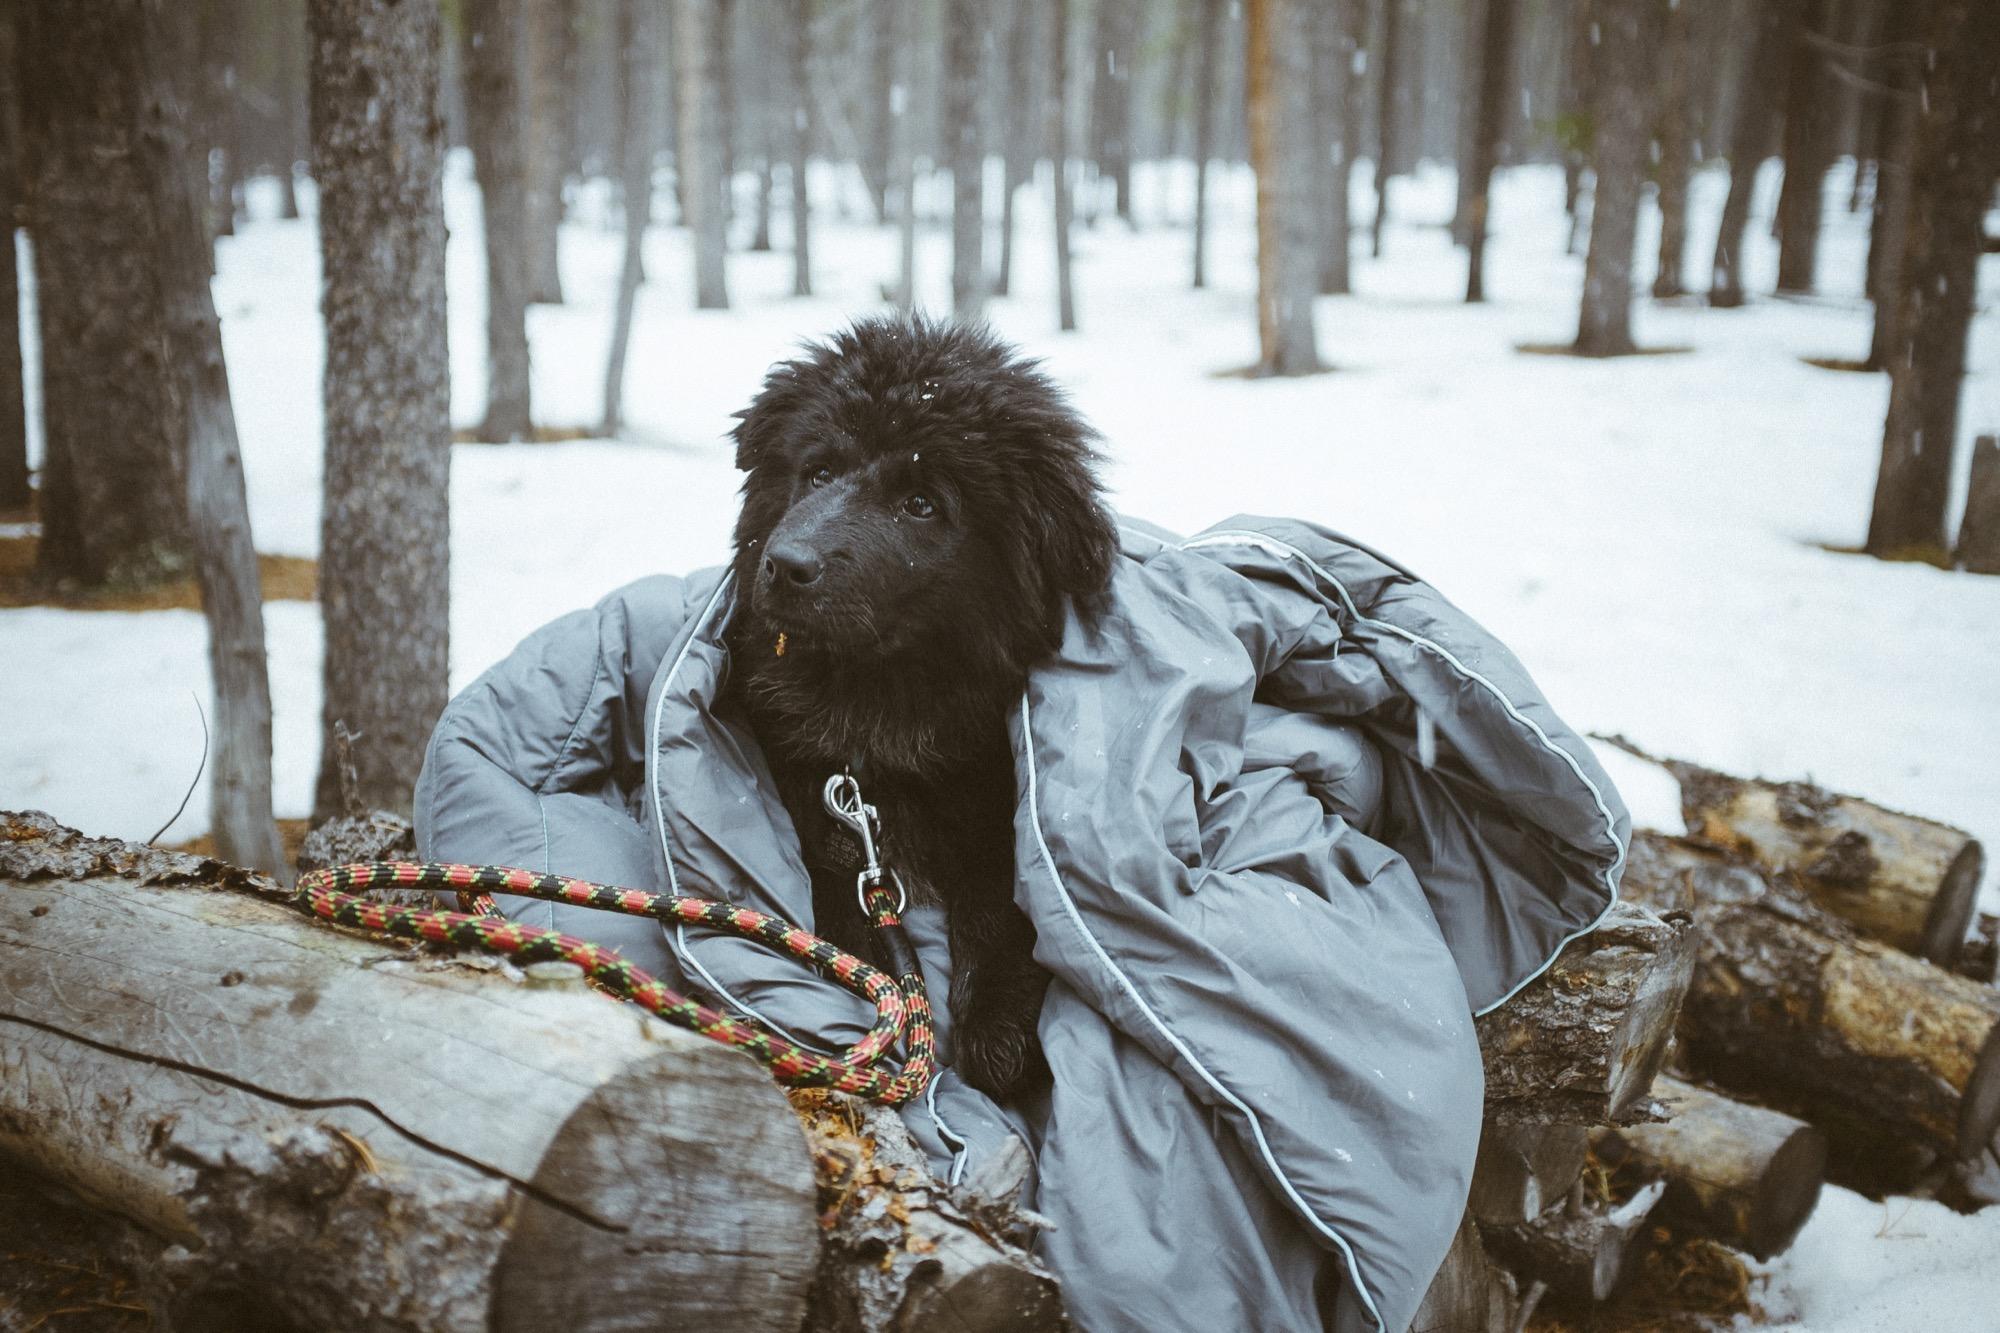 Dog in Rumpl blanket by Adam Concannon_a30